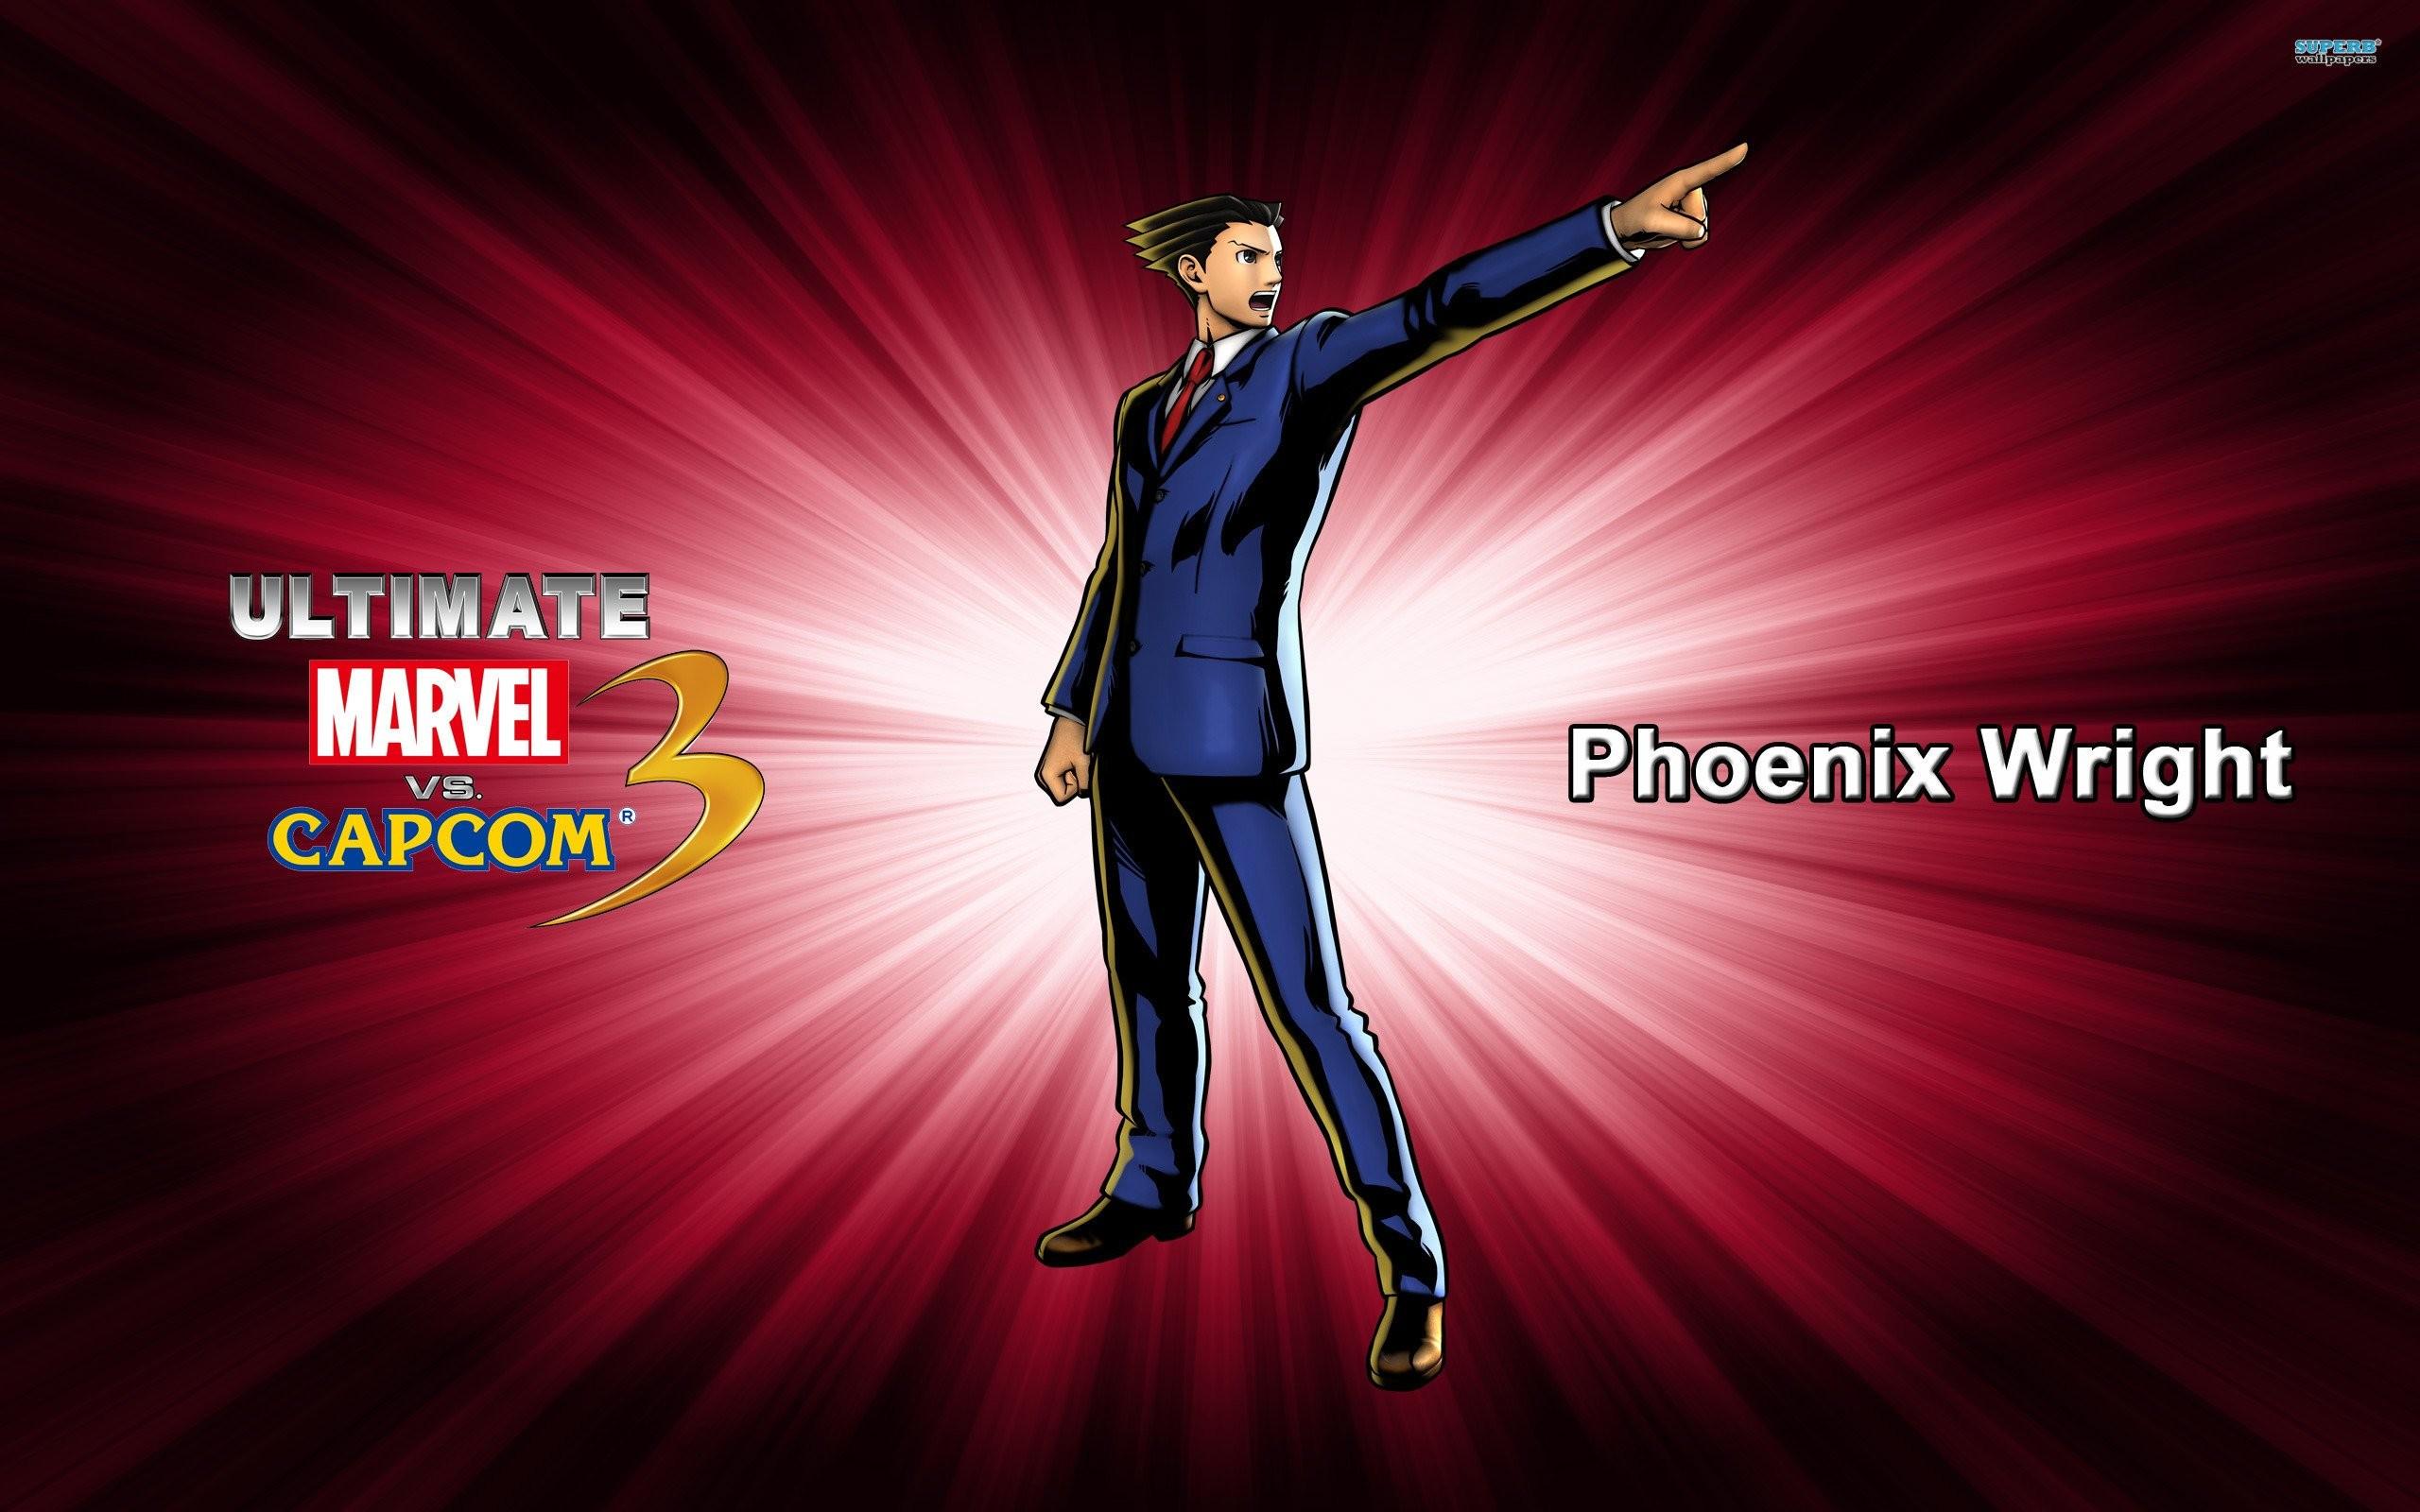 Phoenix Wright – Ultimate Marvel Vs. Capcom 3 375825